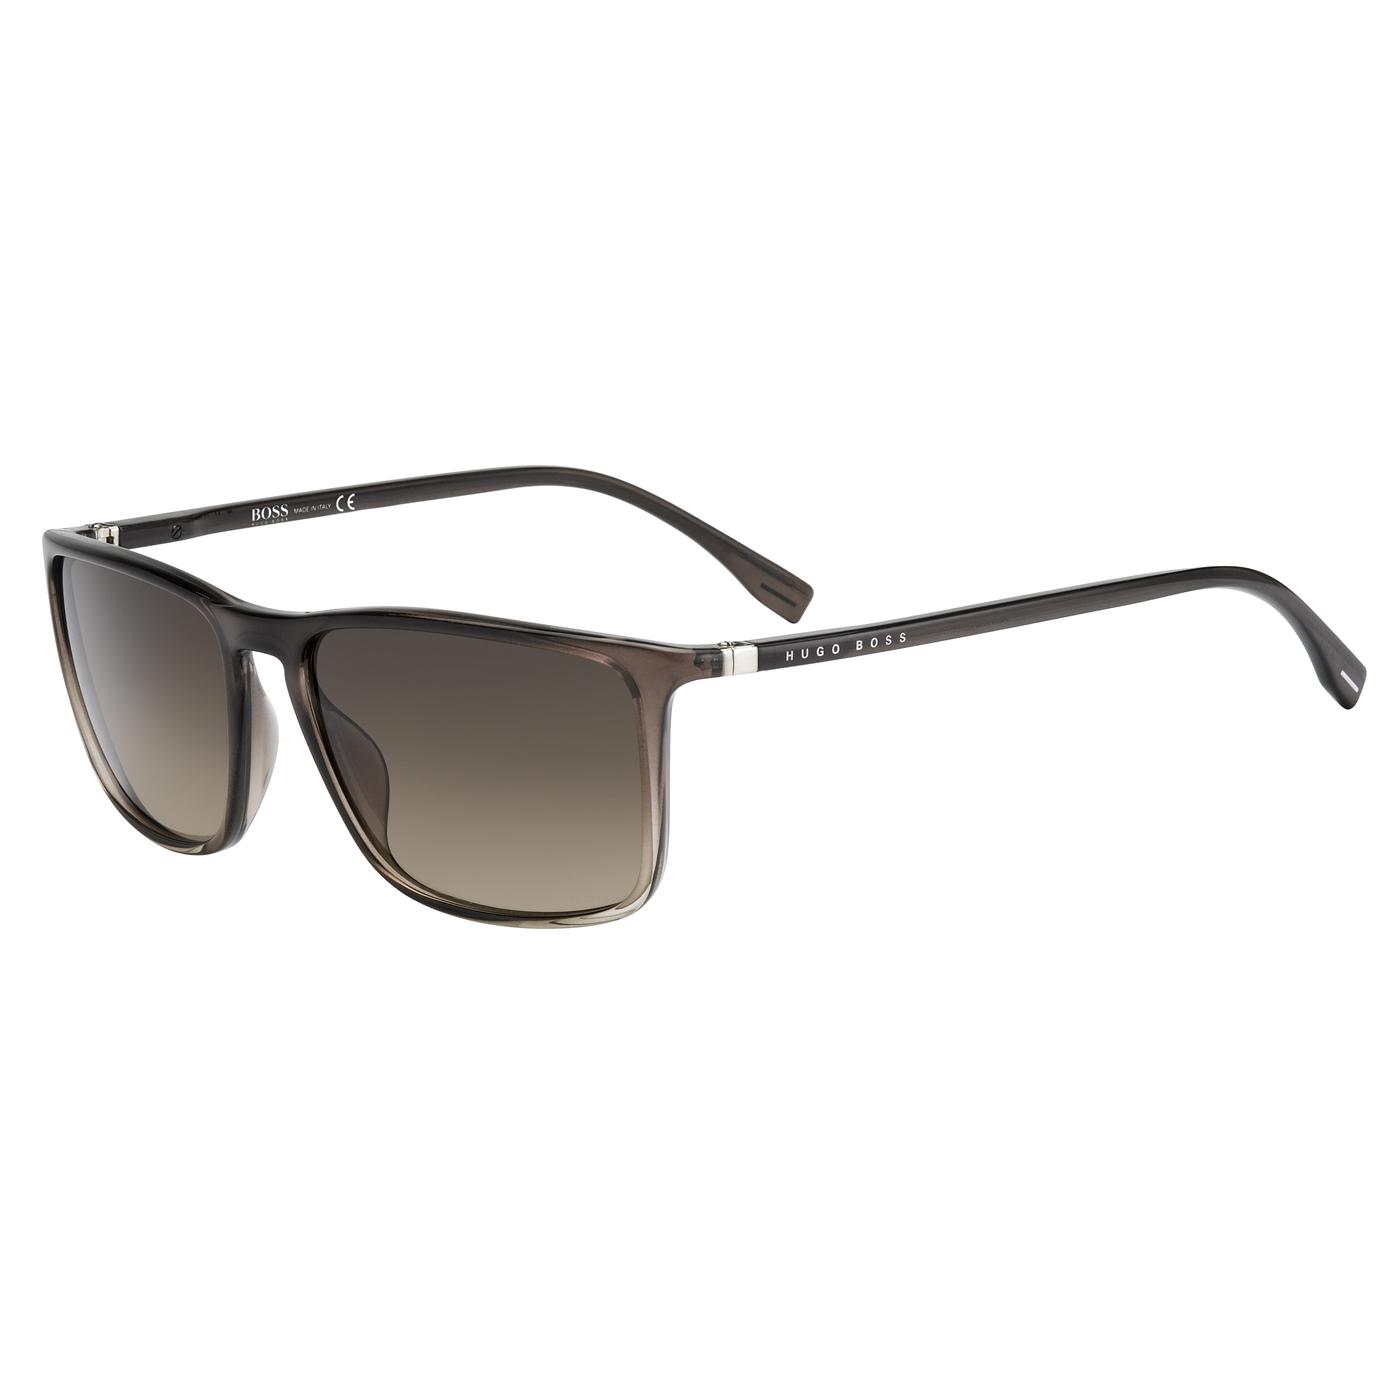 Bilde av Boss Brown Grey Sunglasses BOSS 0665NS NUX 57 HA